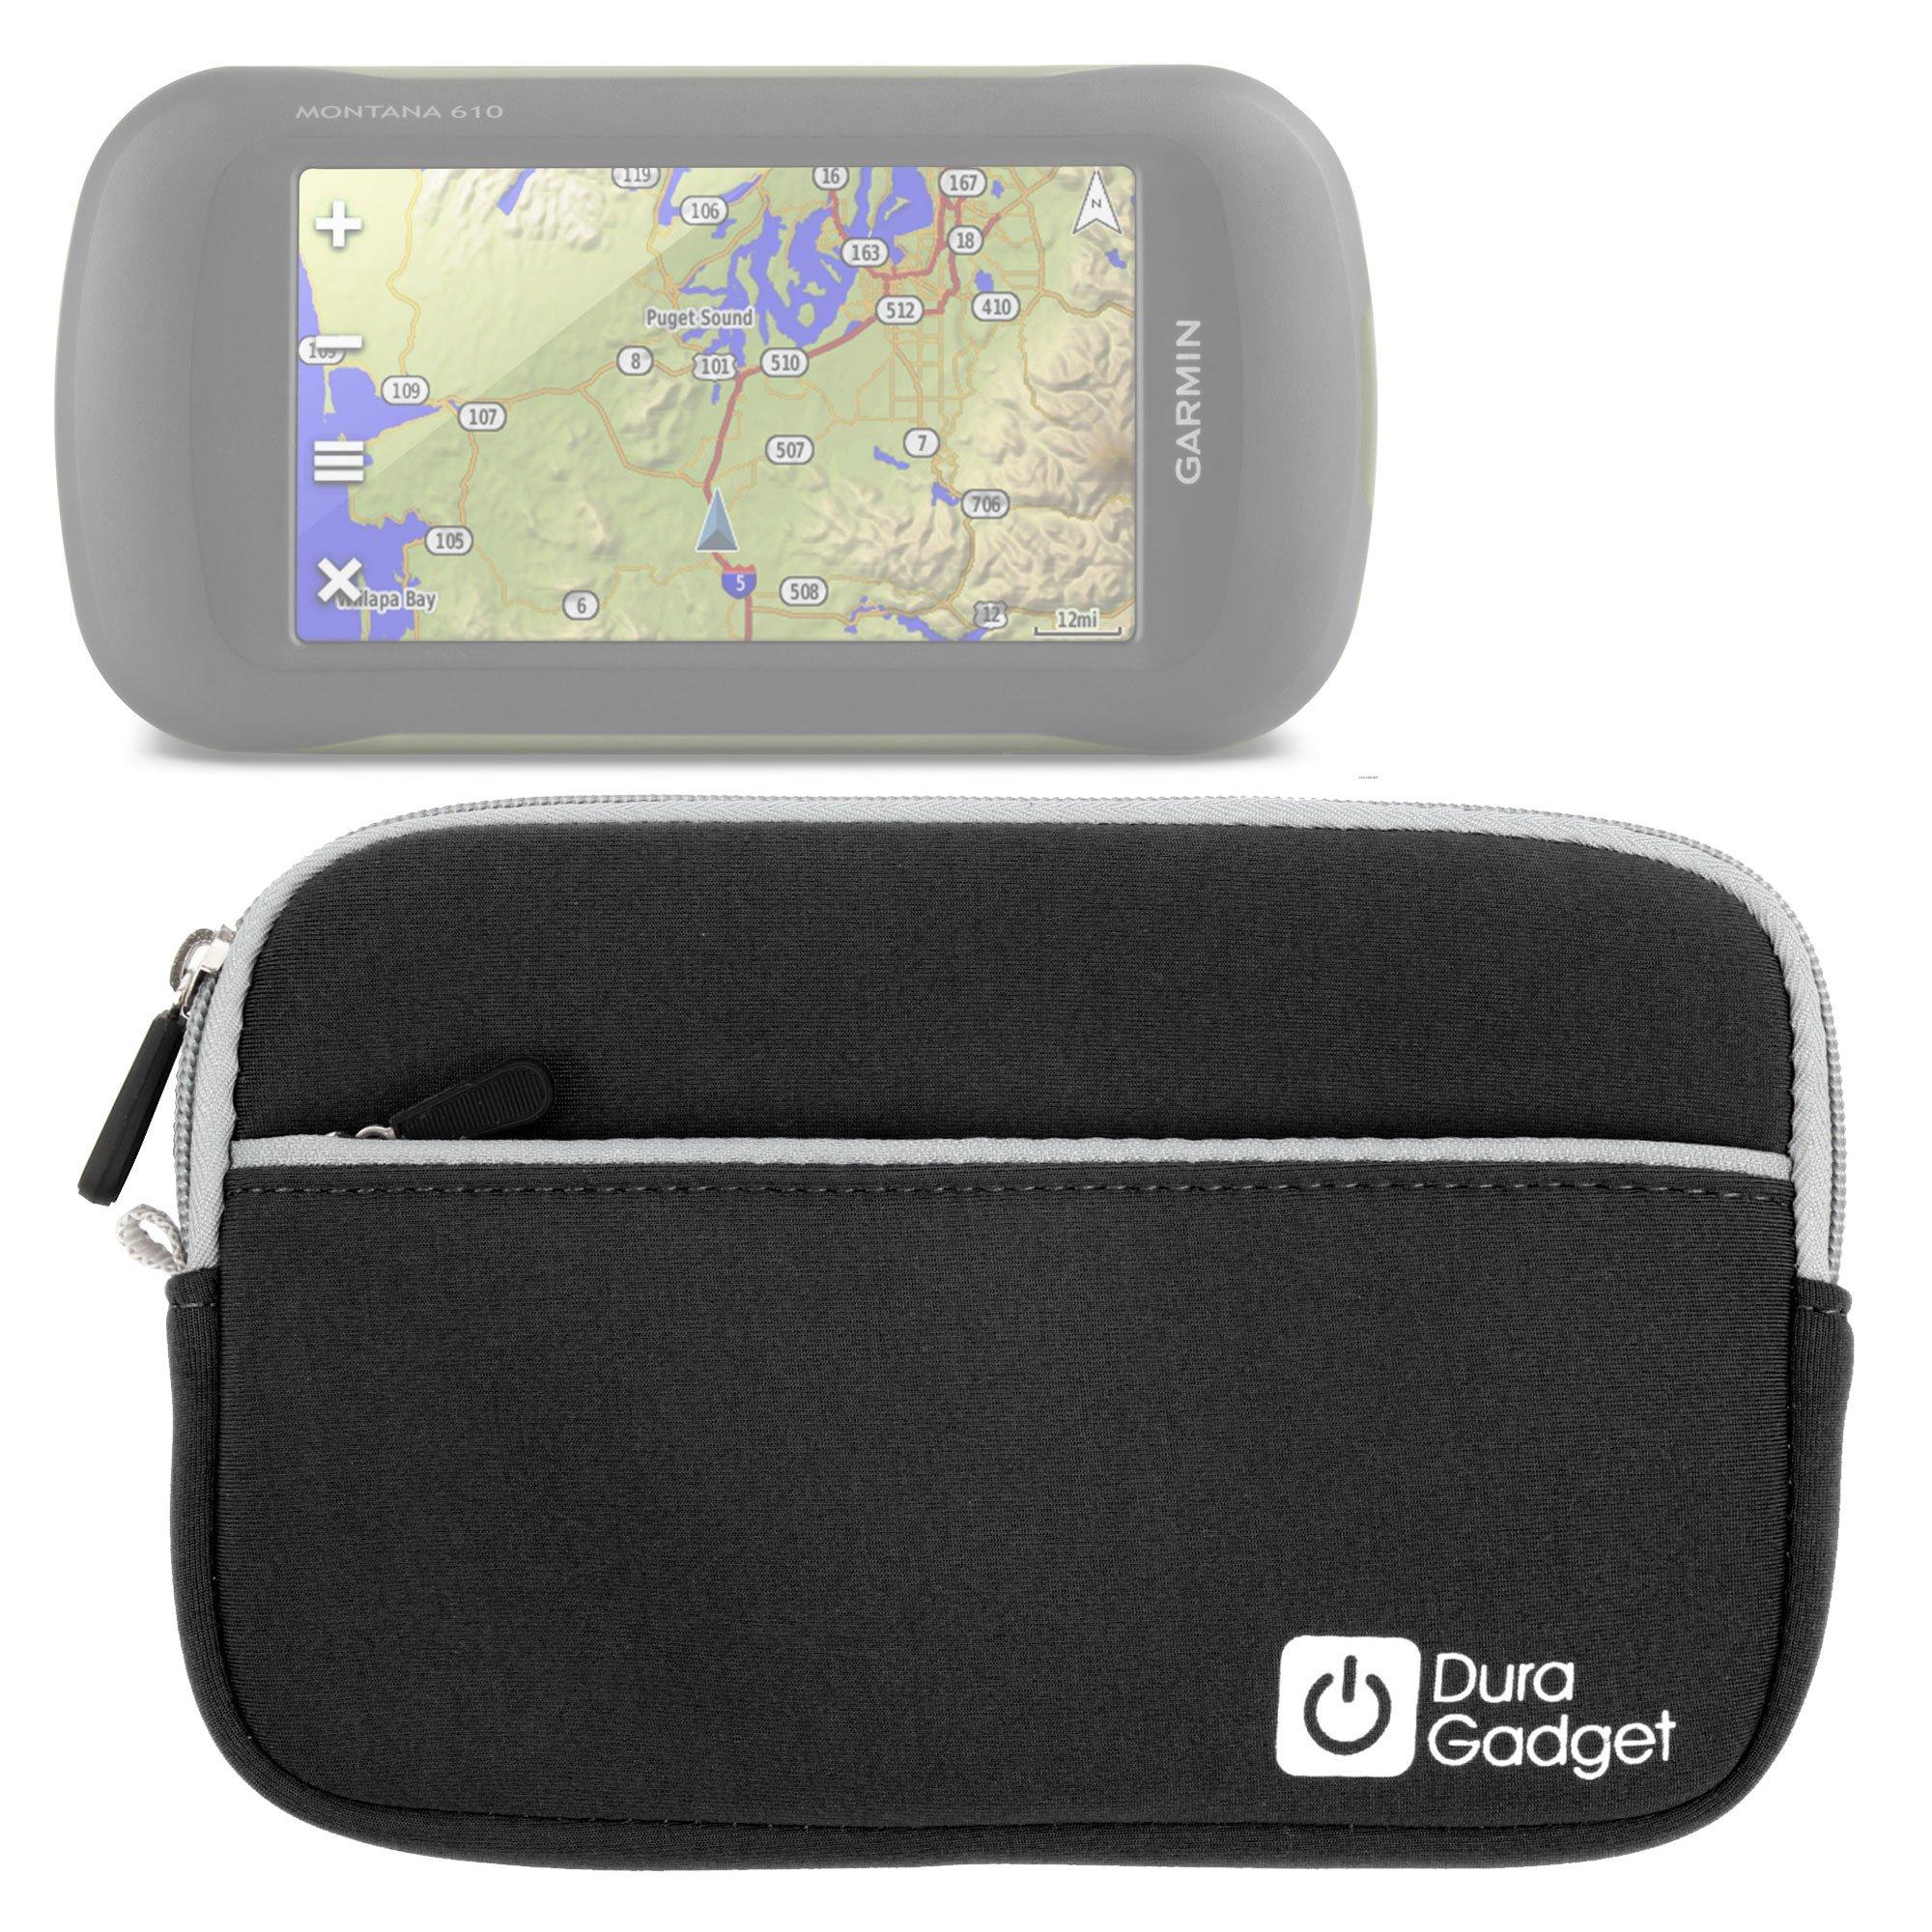 DURAGADGET Premium Quality Black 7'' Water-Resistant Neoprene Case - Compatible with New Garmin Montana 610, Montana 680 & Montana 680T (Geo, Navigation, GLONASS, 8MP, IPX7, MicroSD)